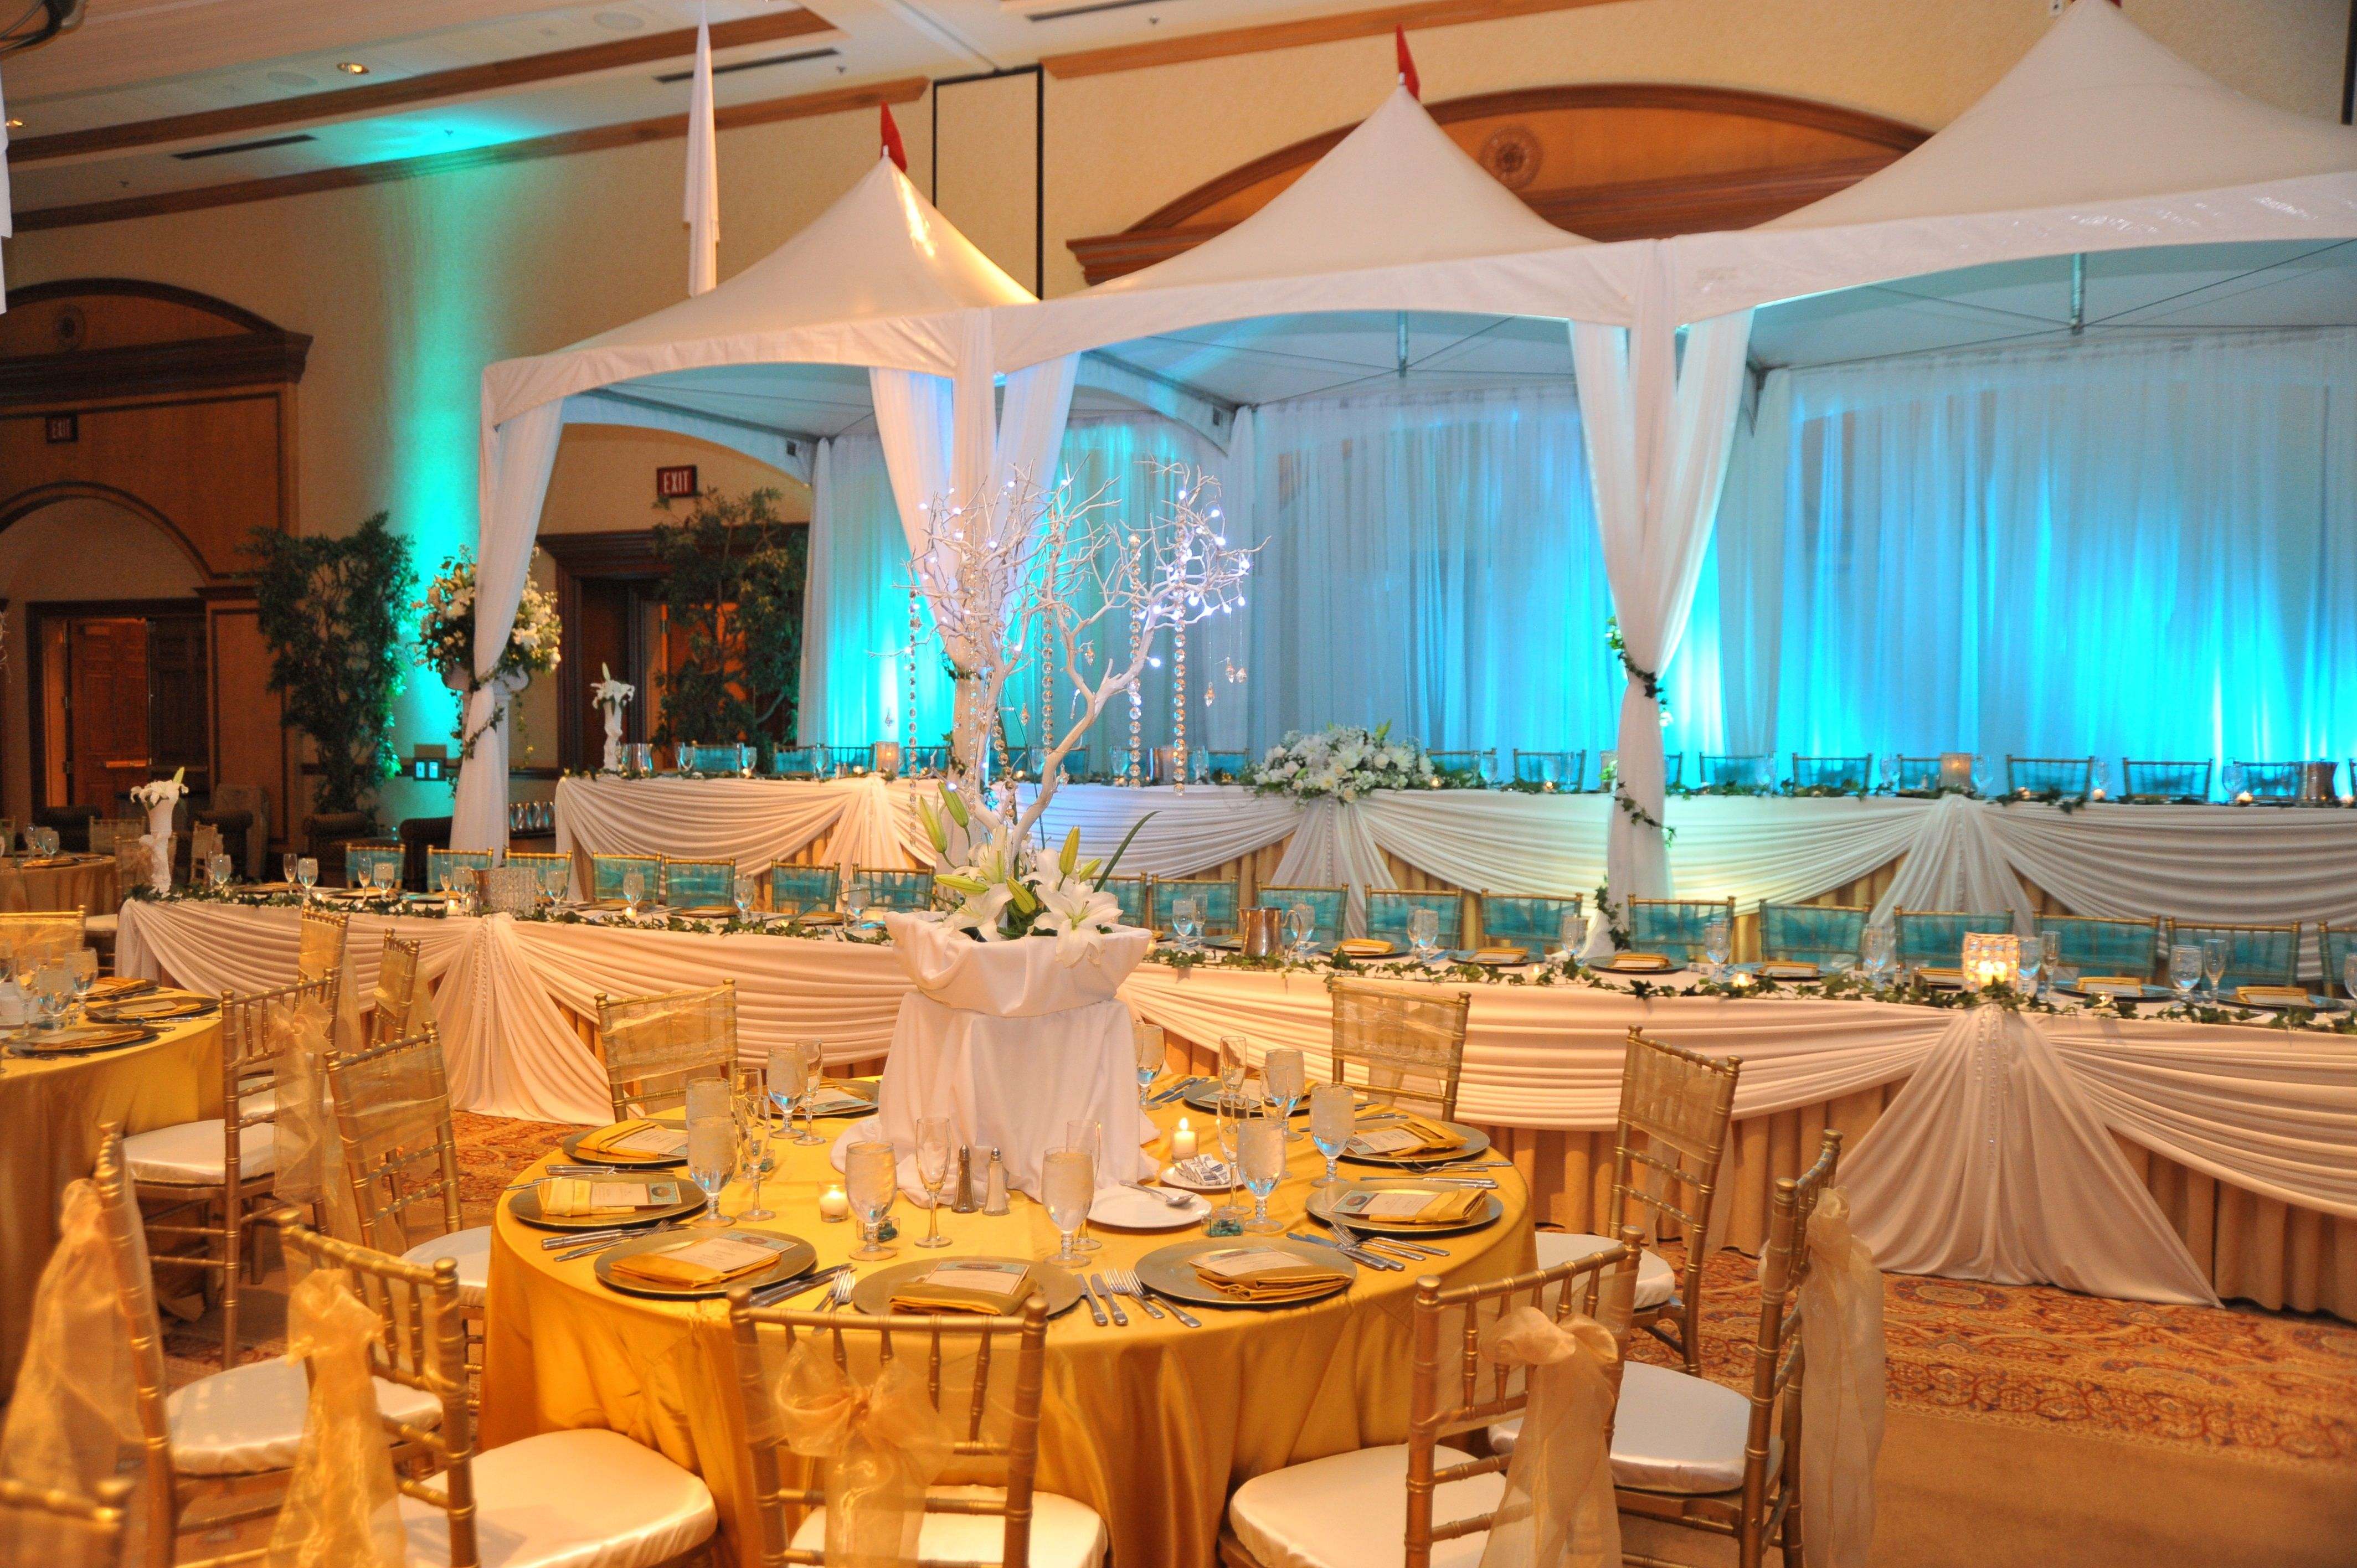 Banquet Halls In North Las Vegas Banquet Hall Event Space Wedding Bar